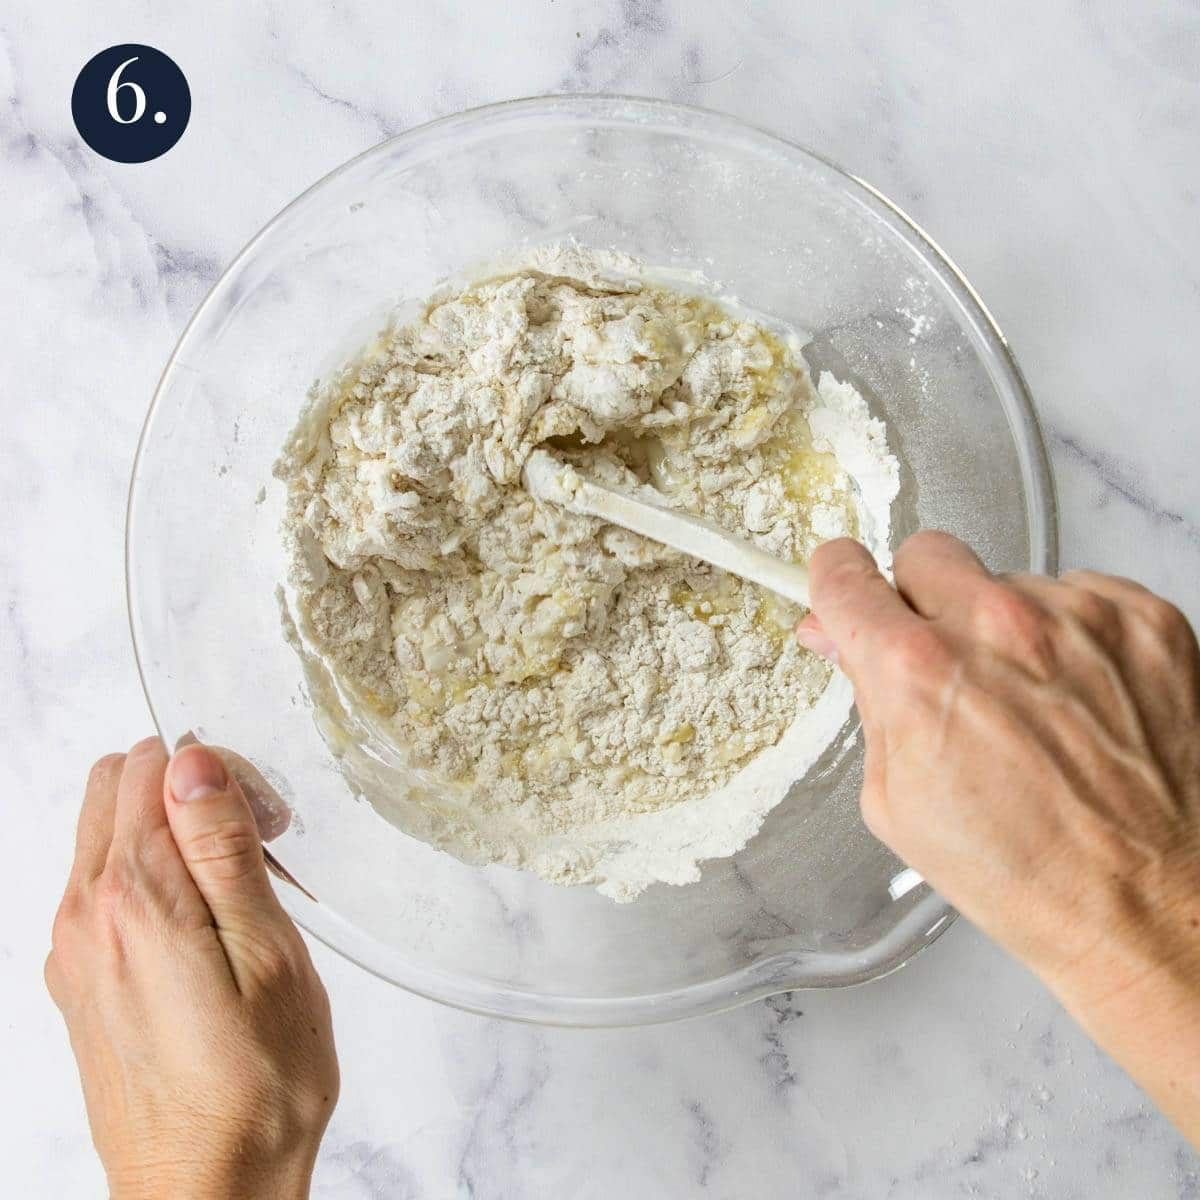 stirring dough in a glass bowl